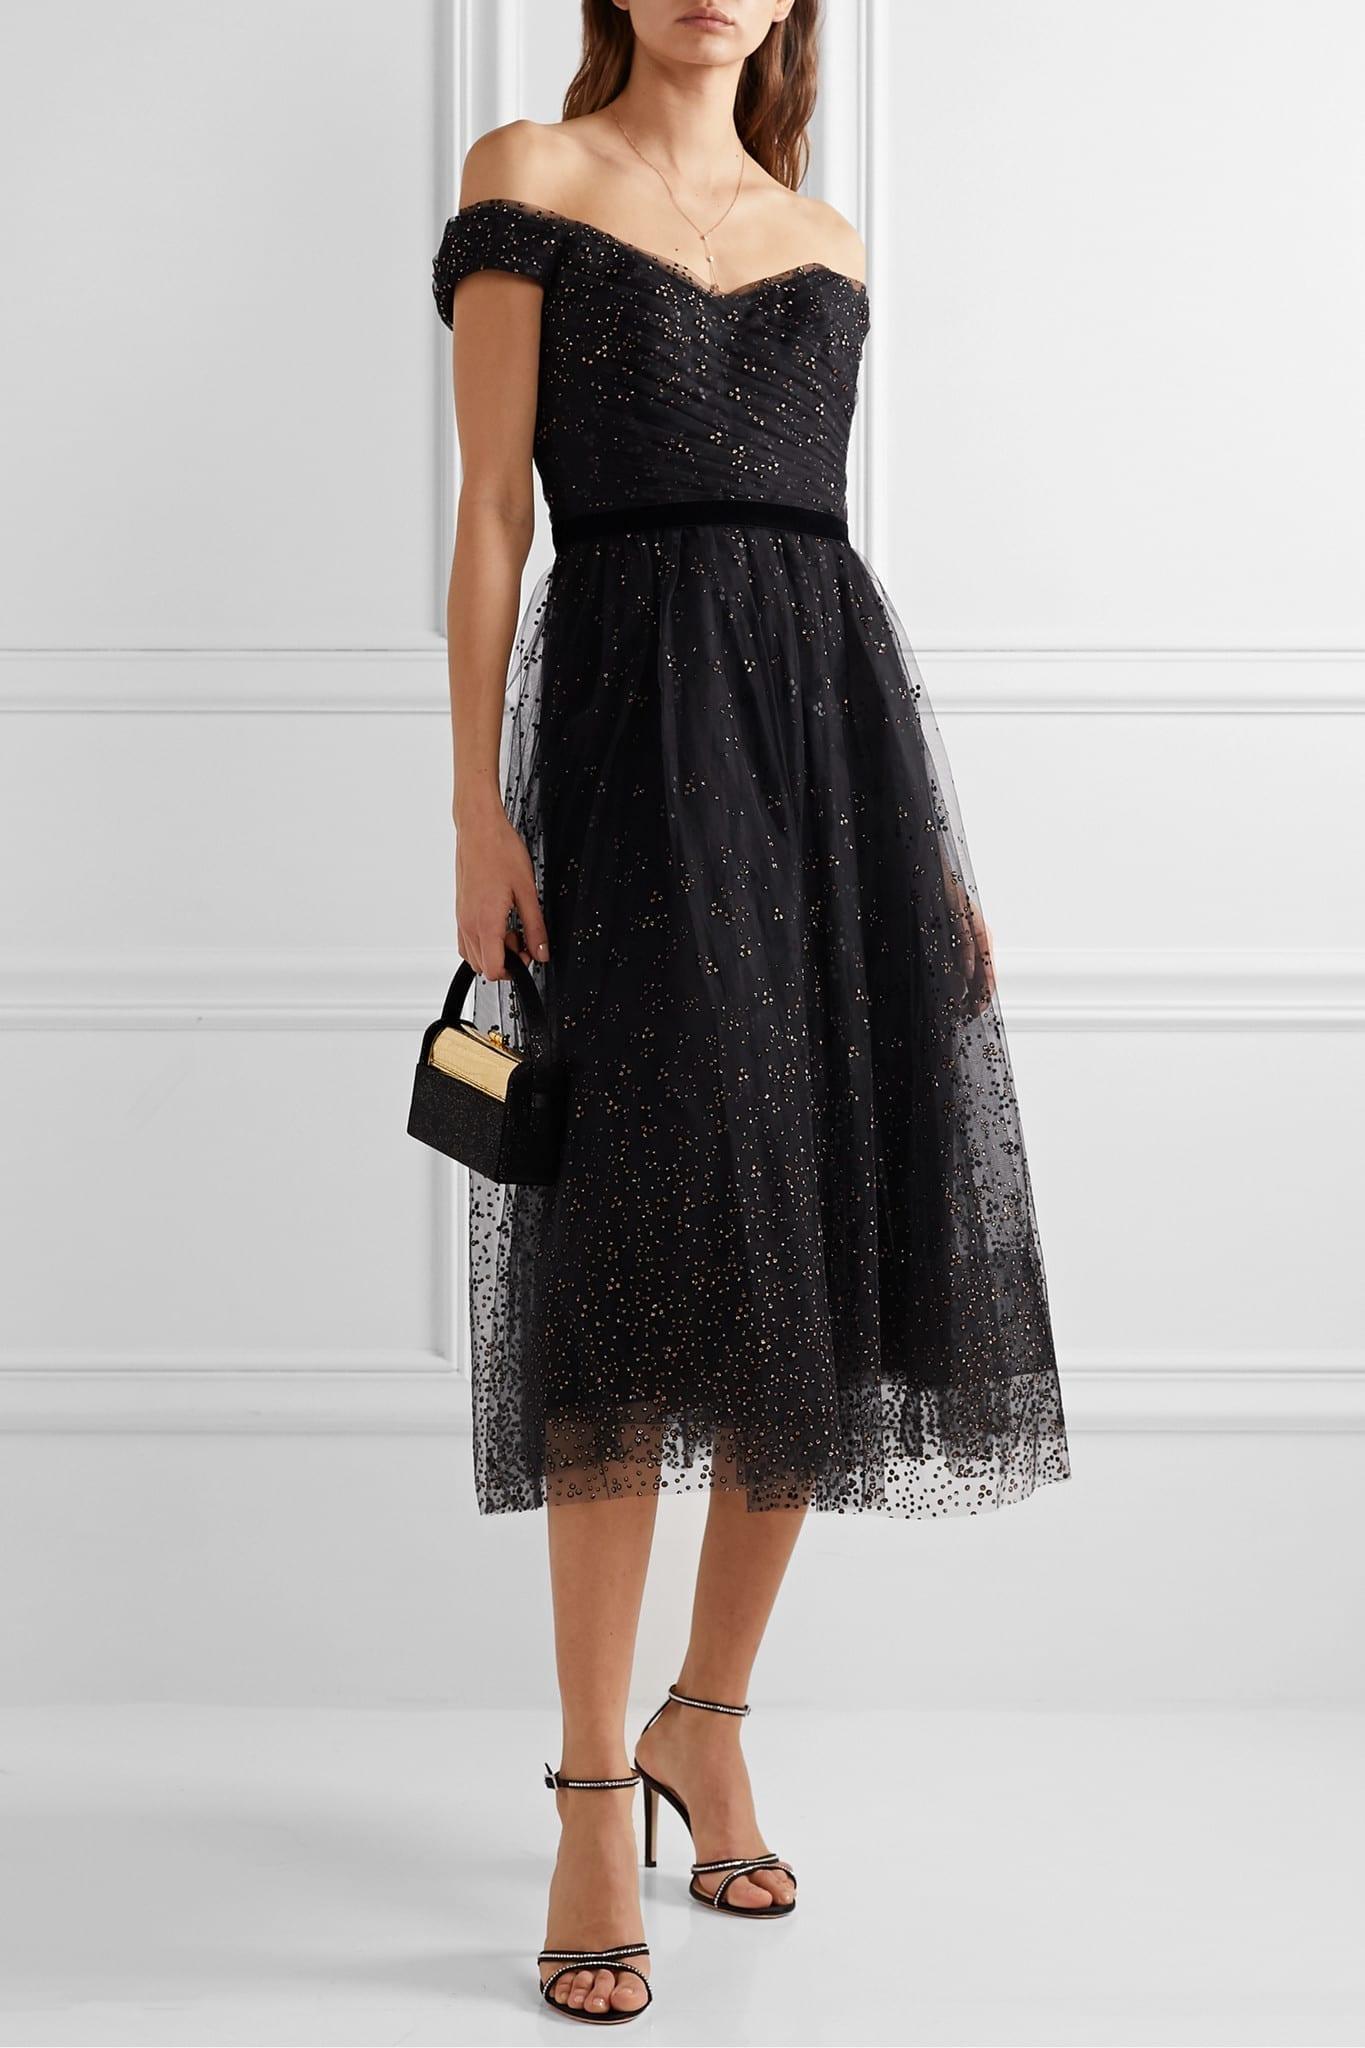 MARCHESA NOTTE Fringed Embellished Embroidered Tulle Midi Dress